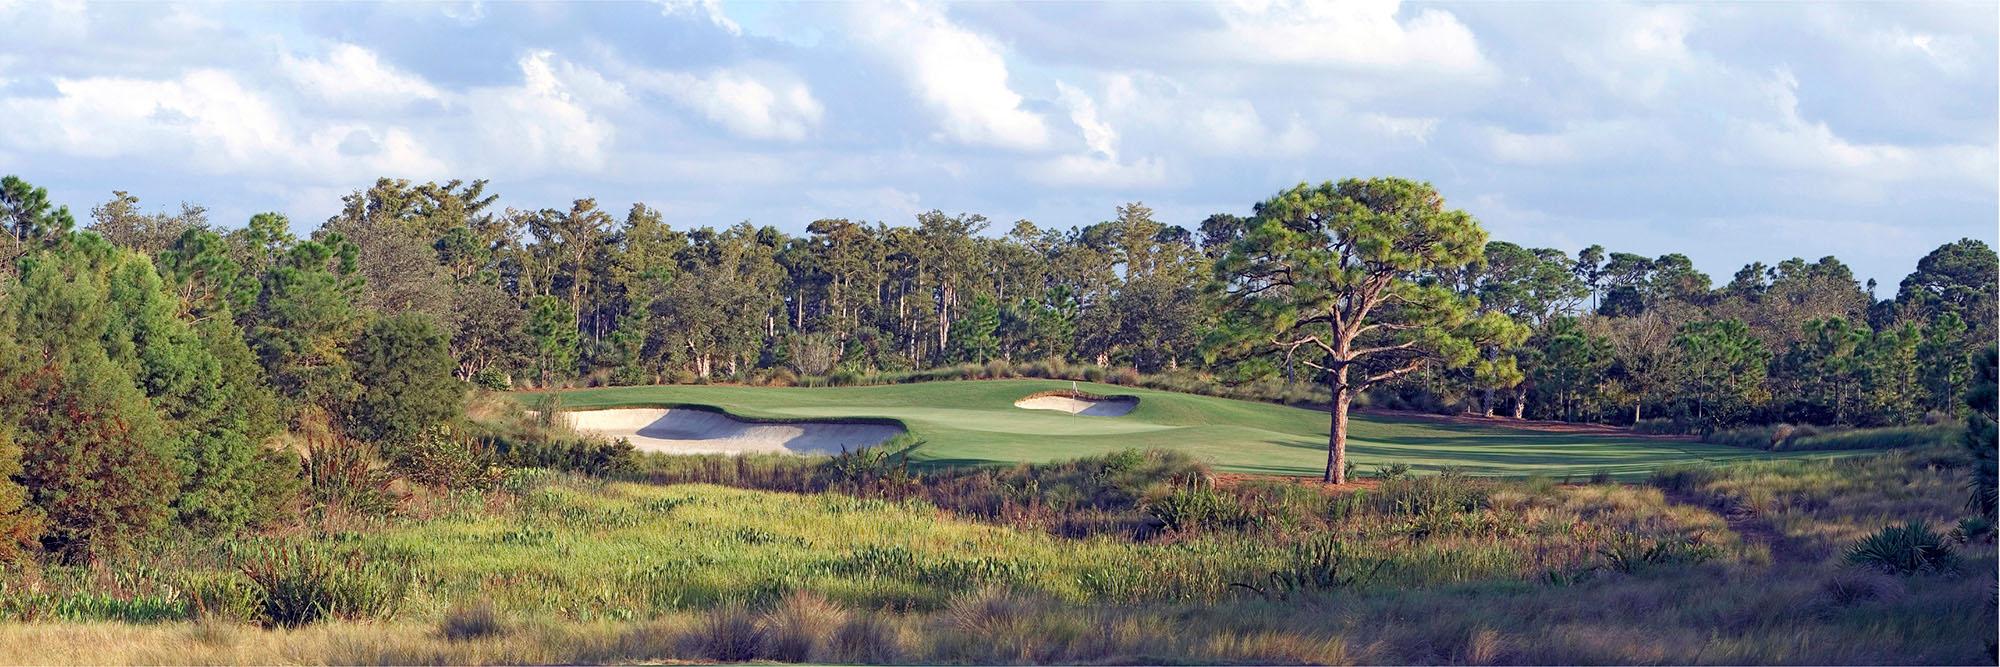 Golf Course Image - Ritz Carlton Jupiter No. 14